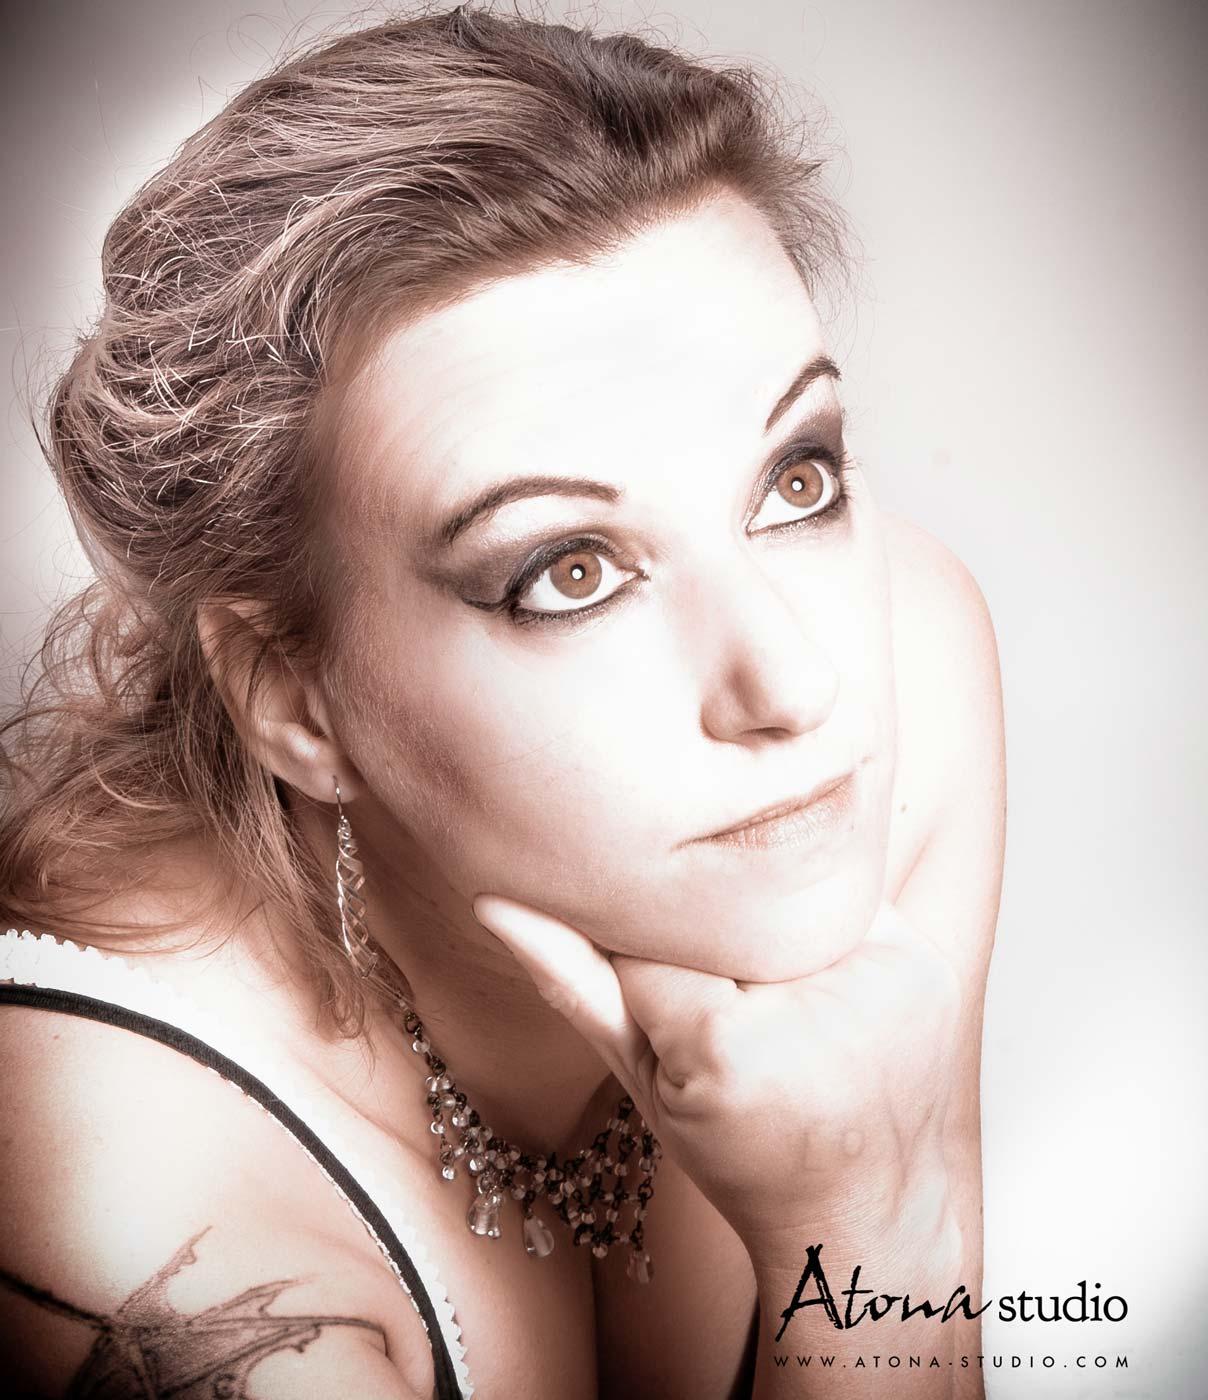 Atona Studio - Portrait Anne